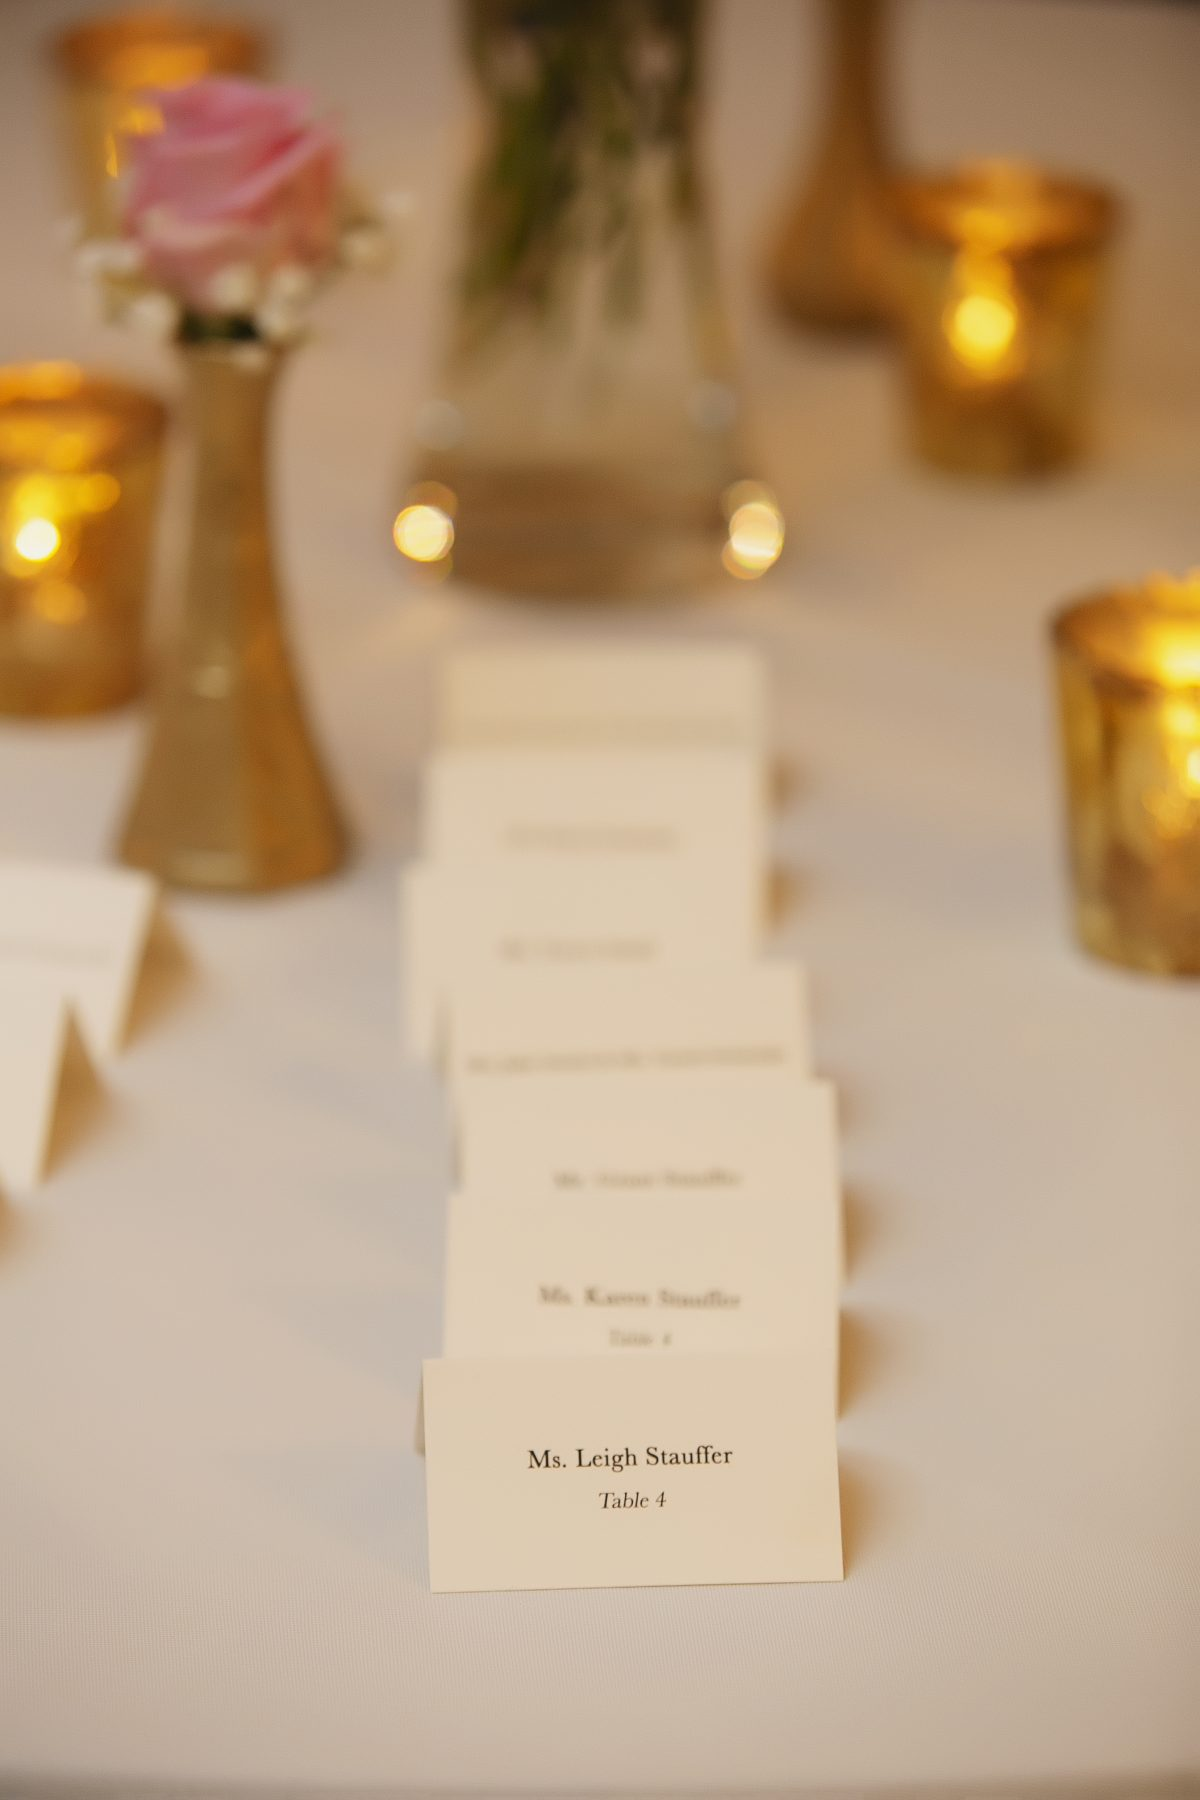 Womens Club of Evanston Wedding